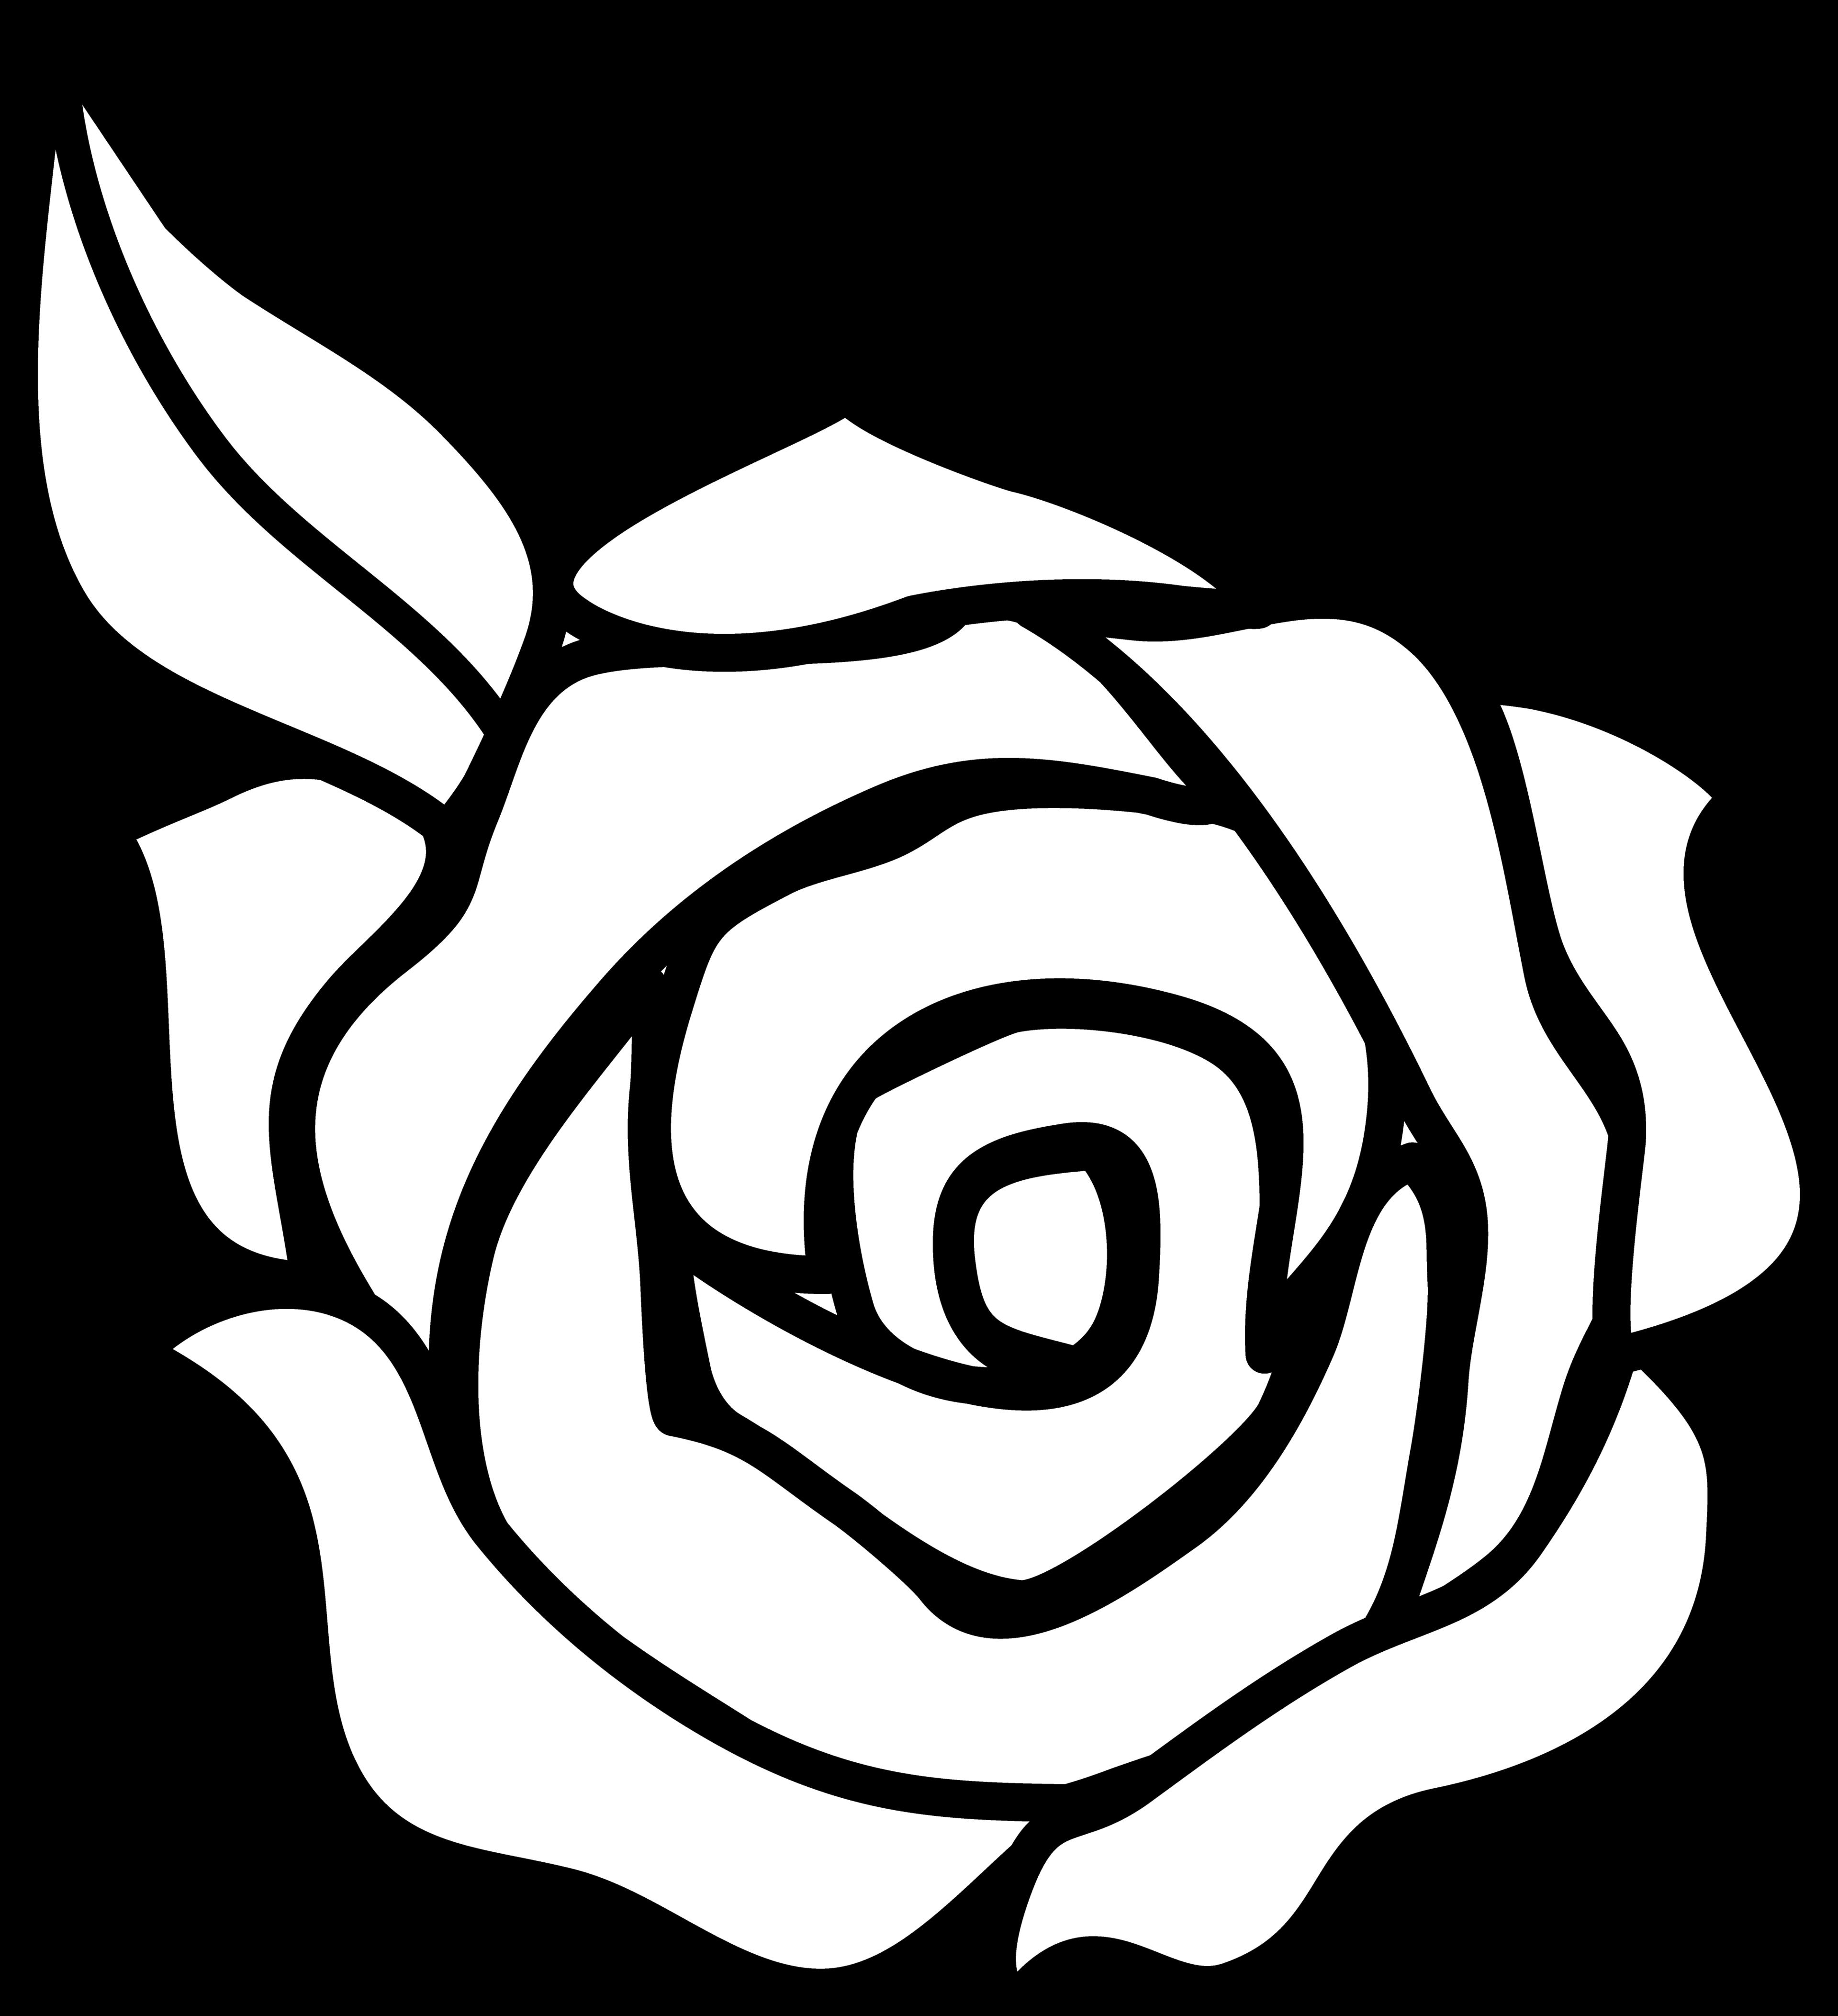 Rose Outline Clipart Panda .-Rose Outline Clipart Panda .-16